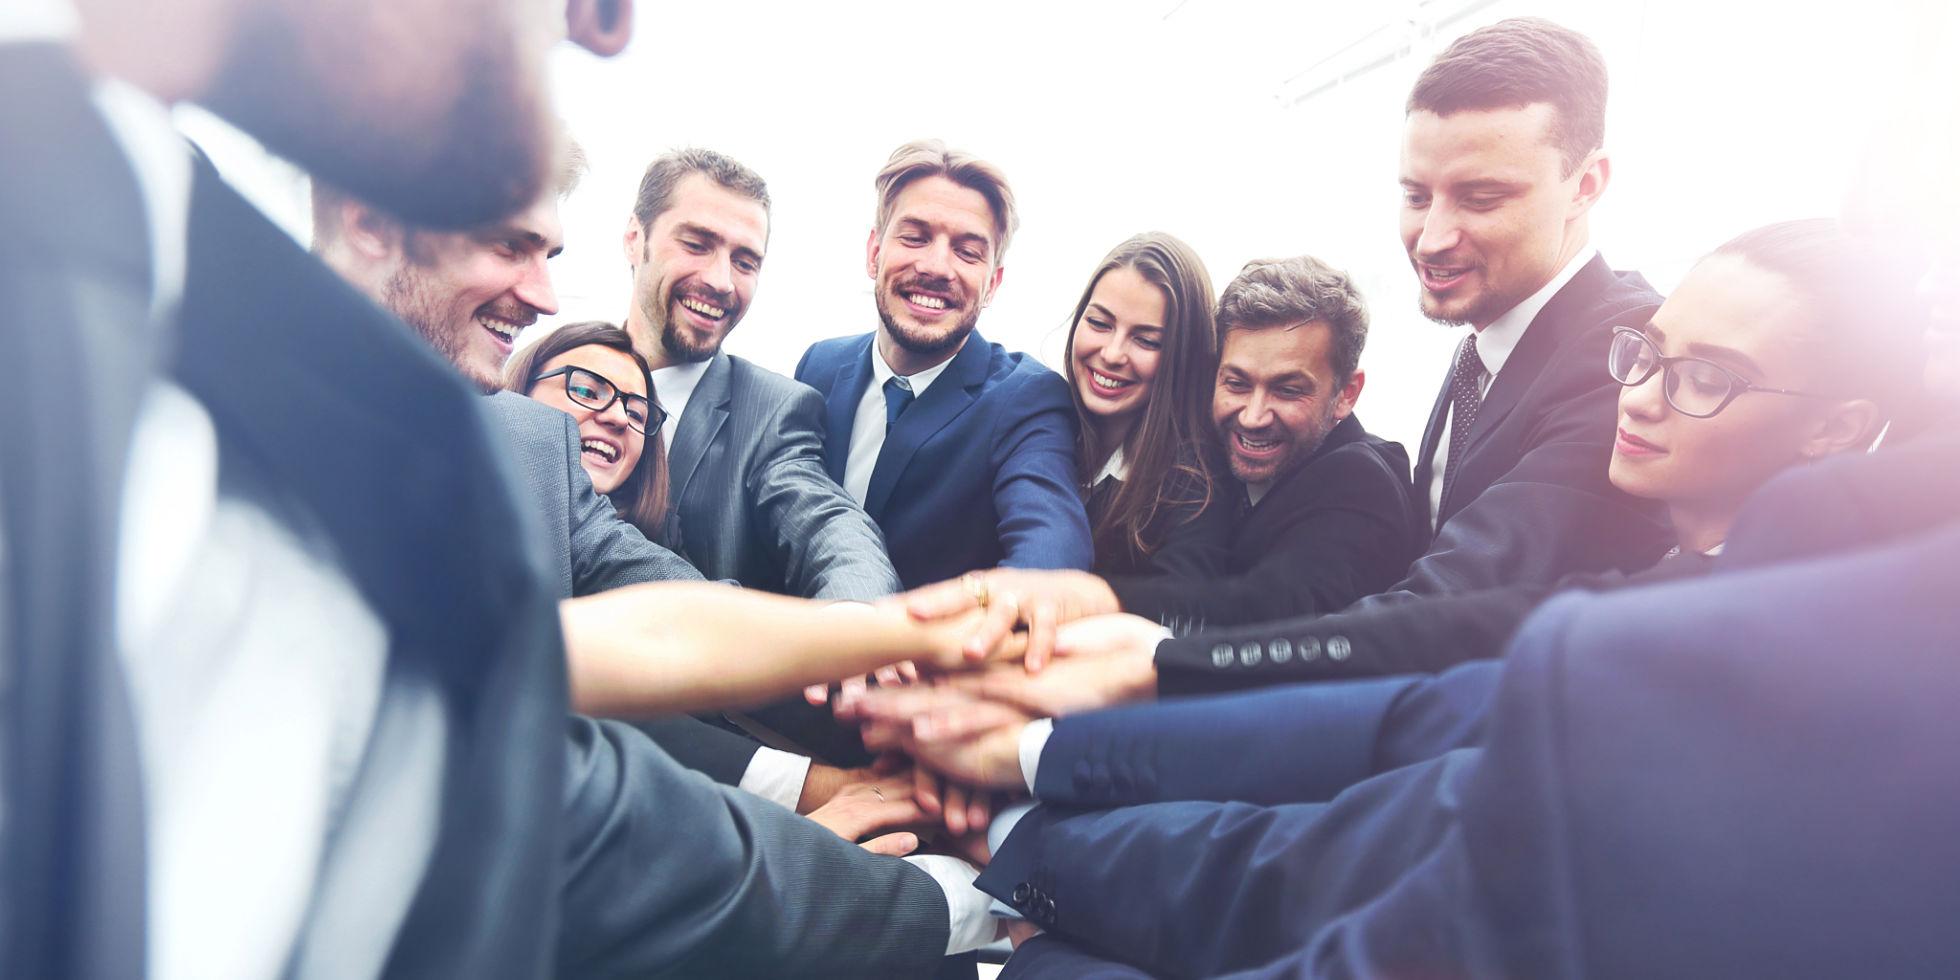 The Team, creative brand design agency, brand strategy, brand purpose, brand identity, marketing campaigns, visual identity, internal communications, employee engagement, brand crisis